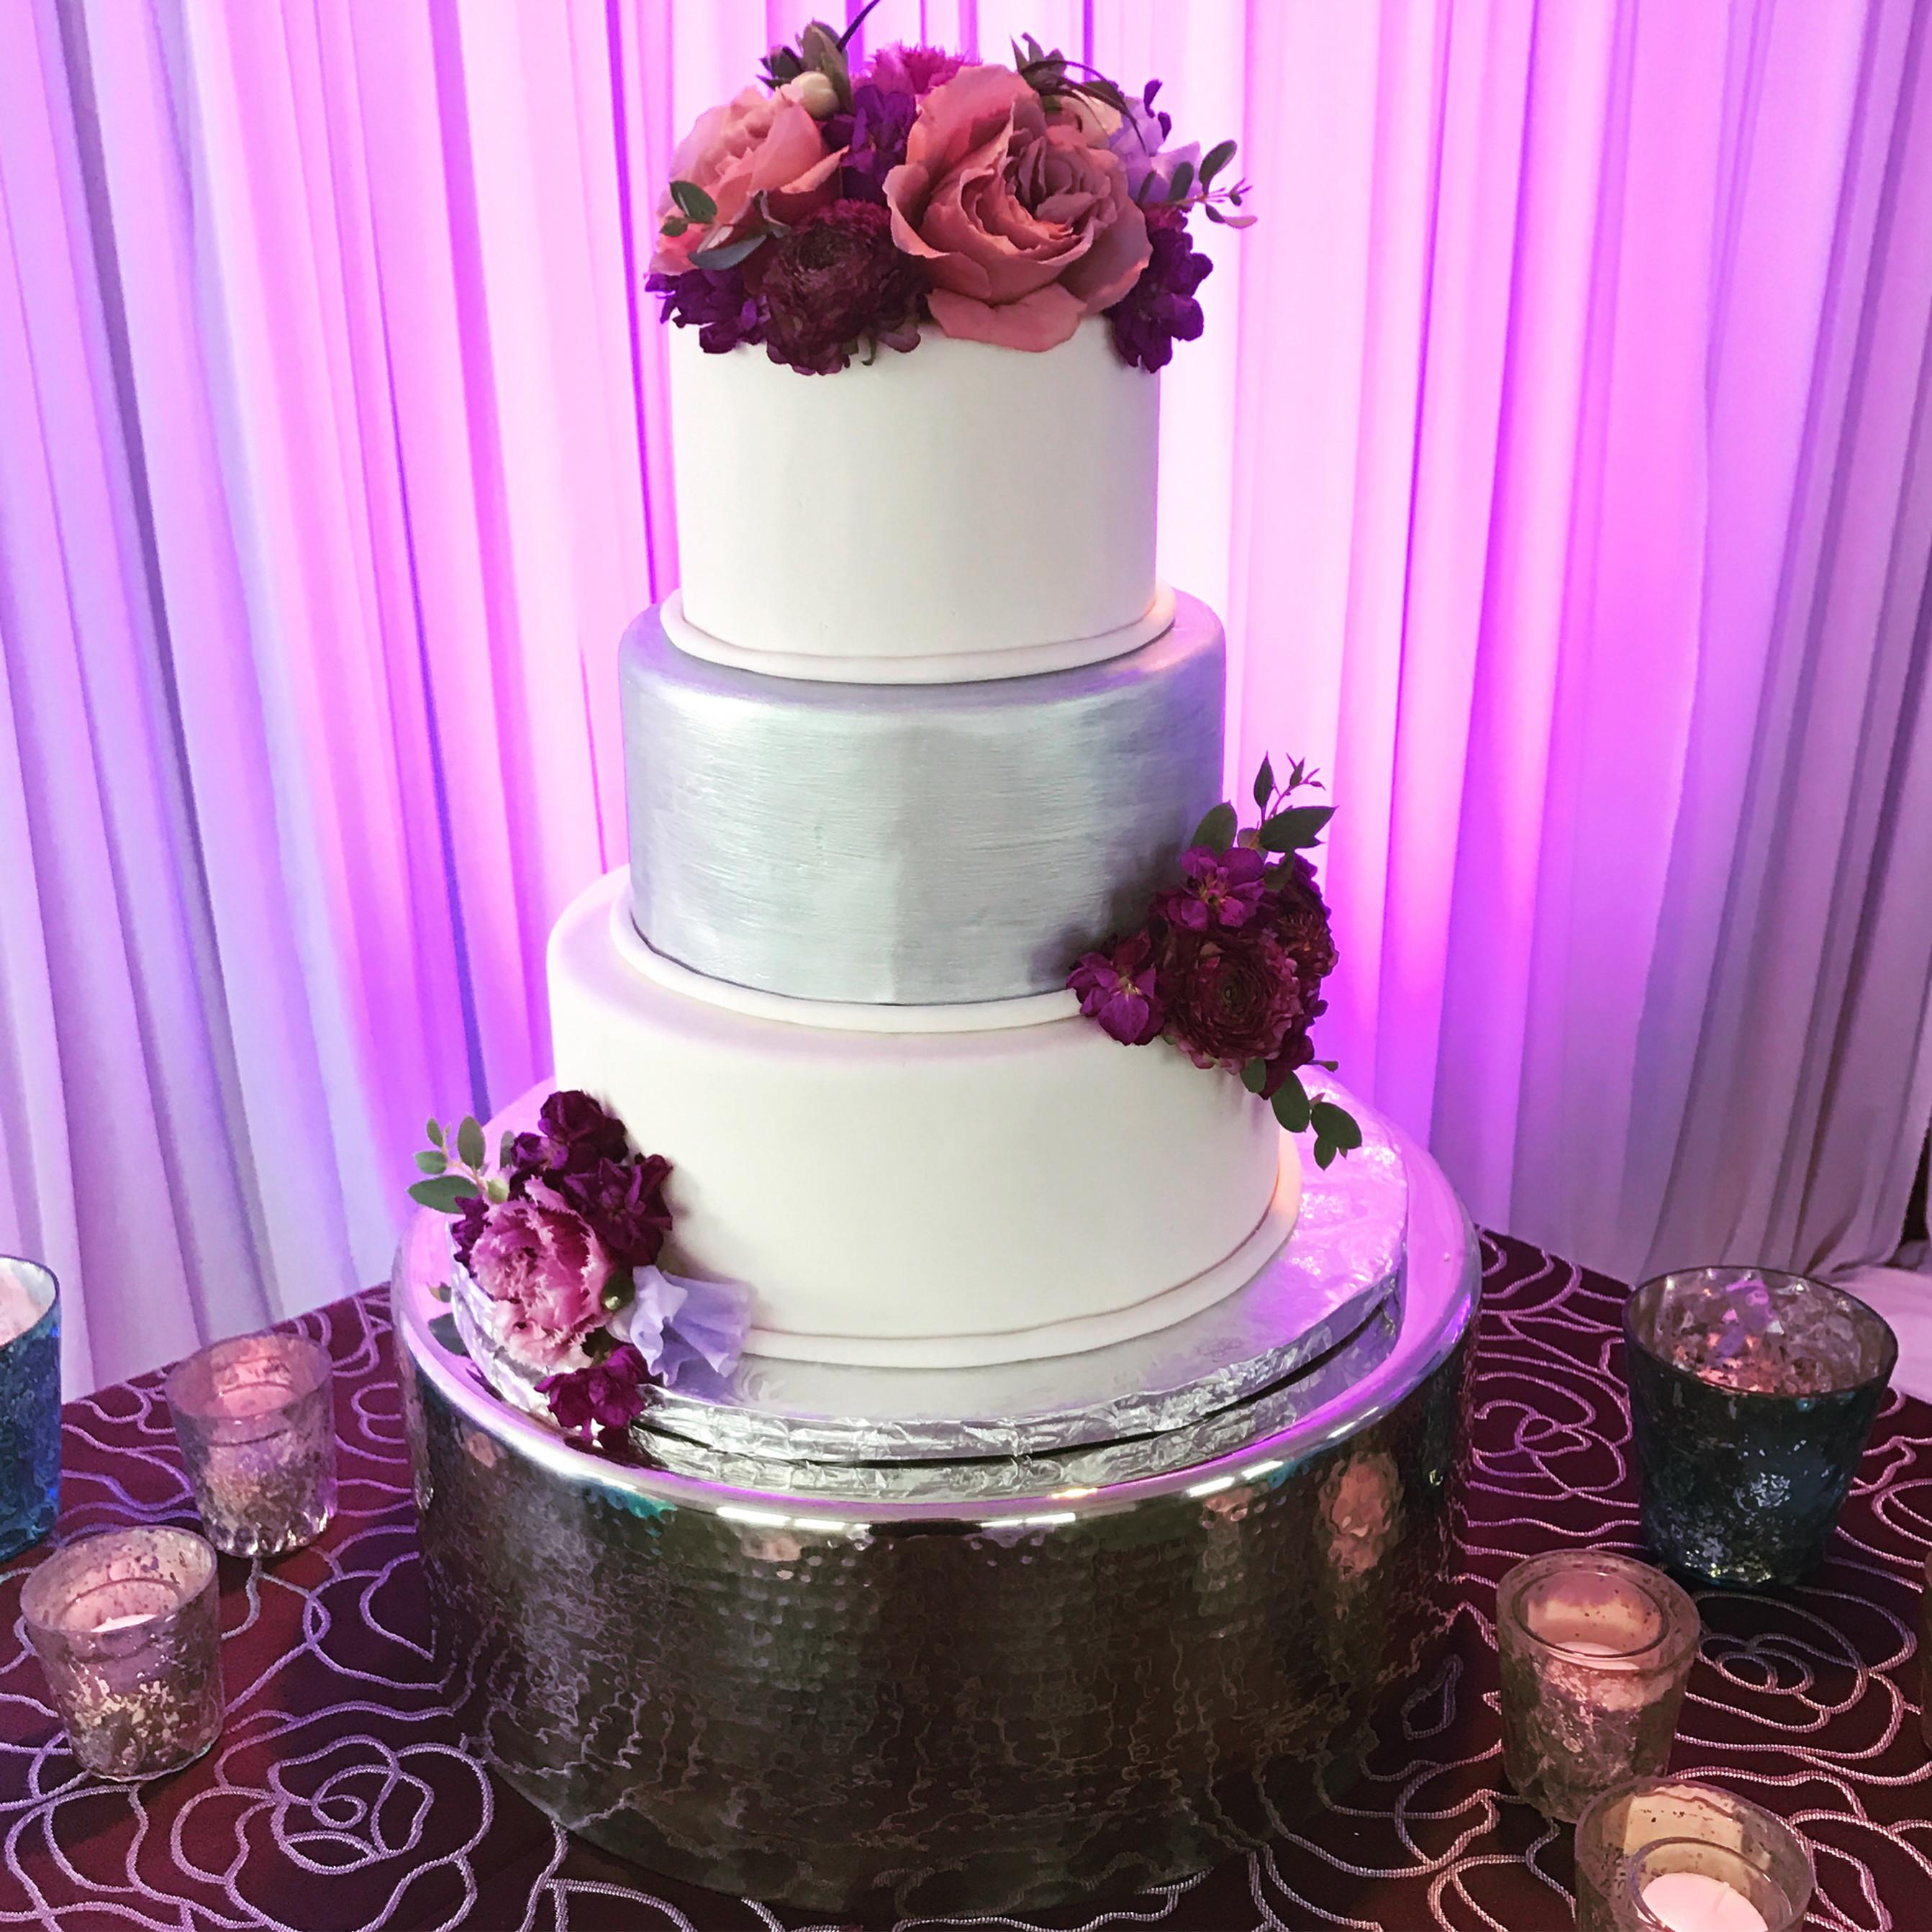 Purple and Silver Wedding Cake | A Piece of Cake - Wedding Cake ...